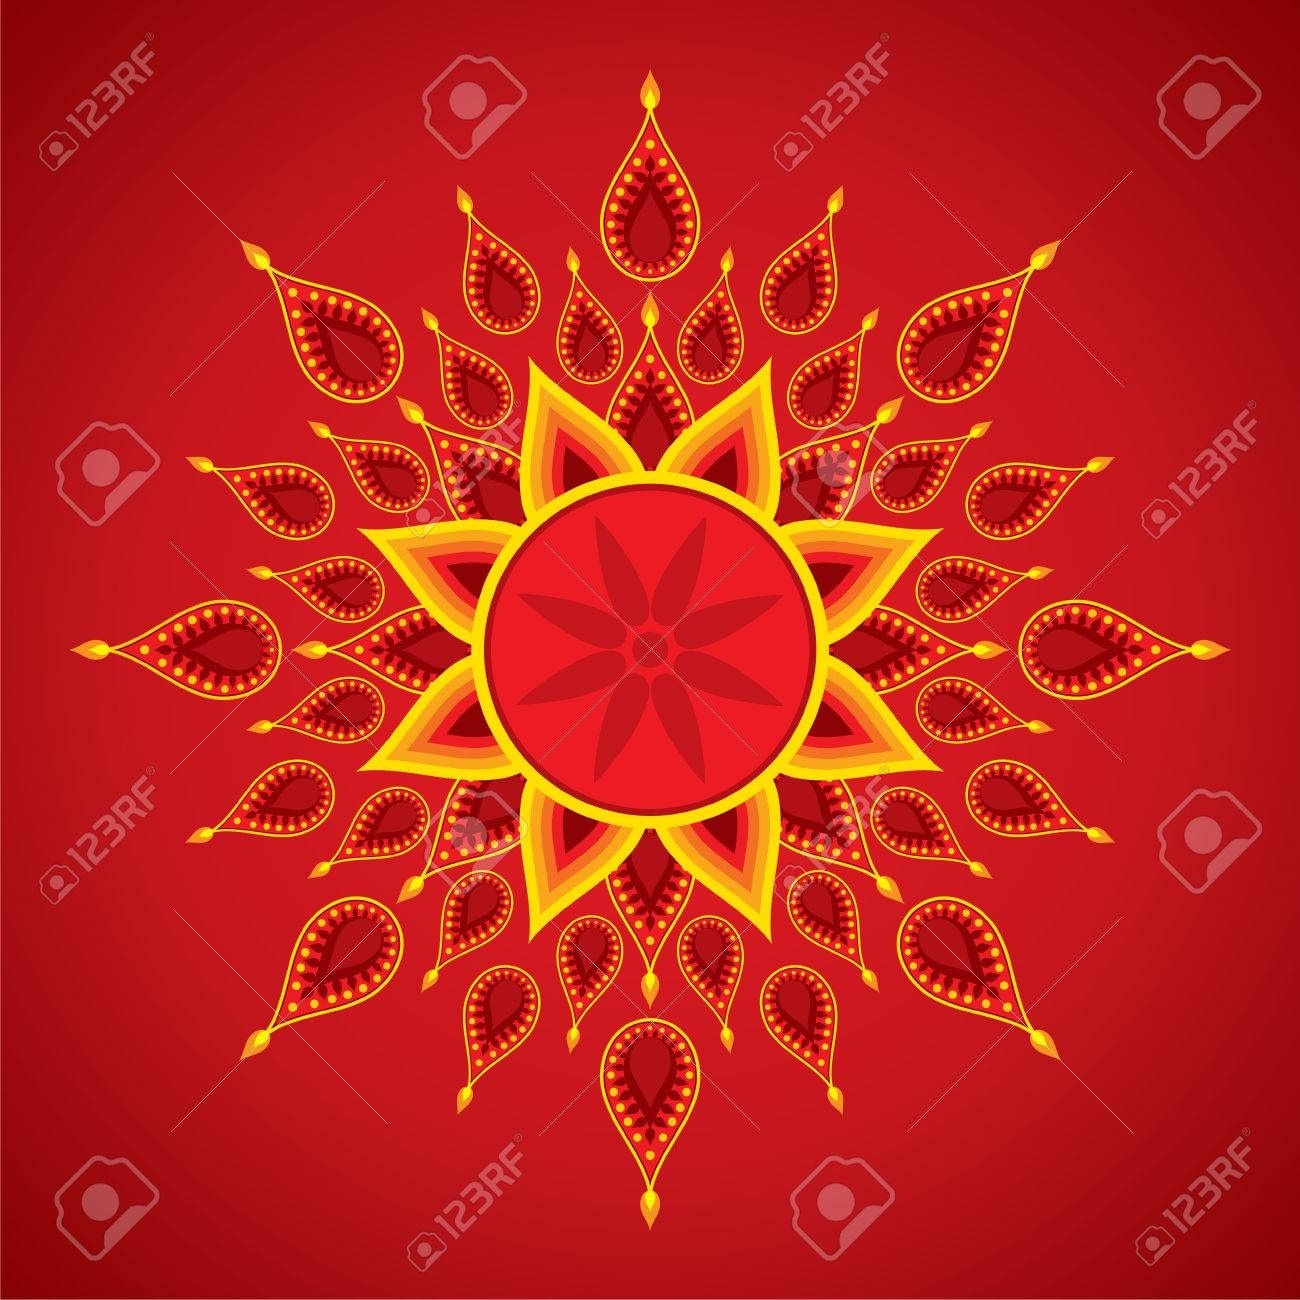 Creative diwali greeting card design vector royalty free cliparts creative diwali greeting card design vector stock vector 47040010 m4hsunfo